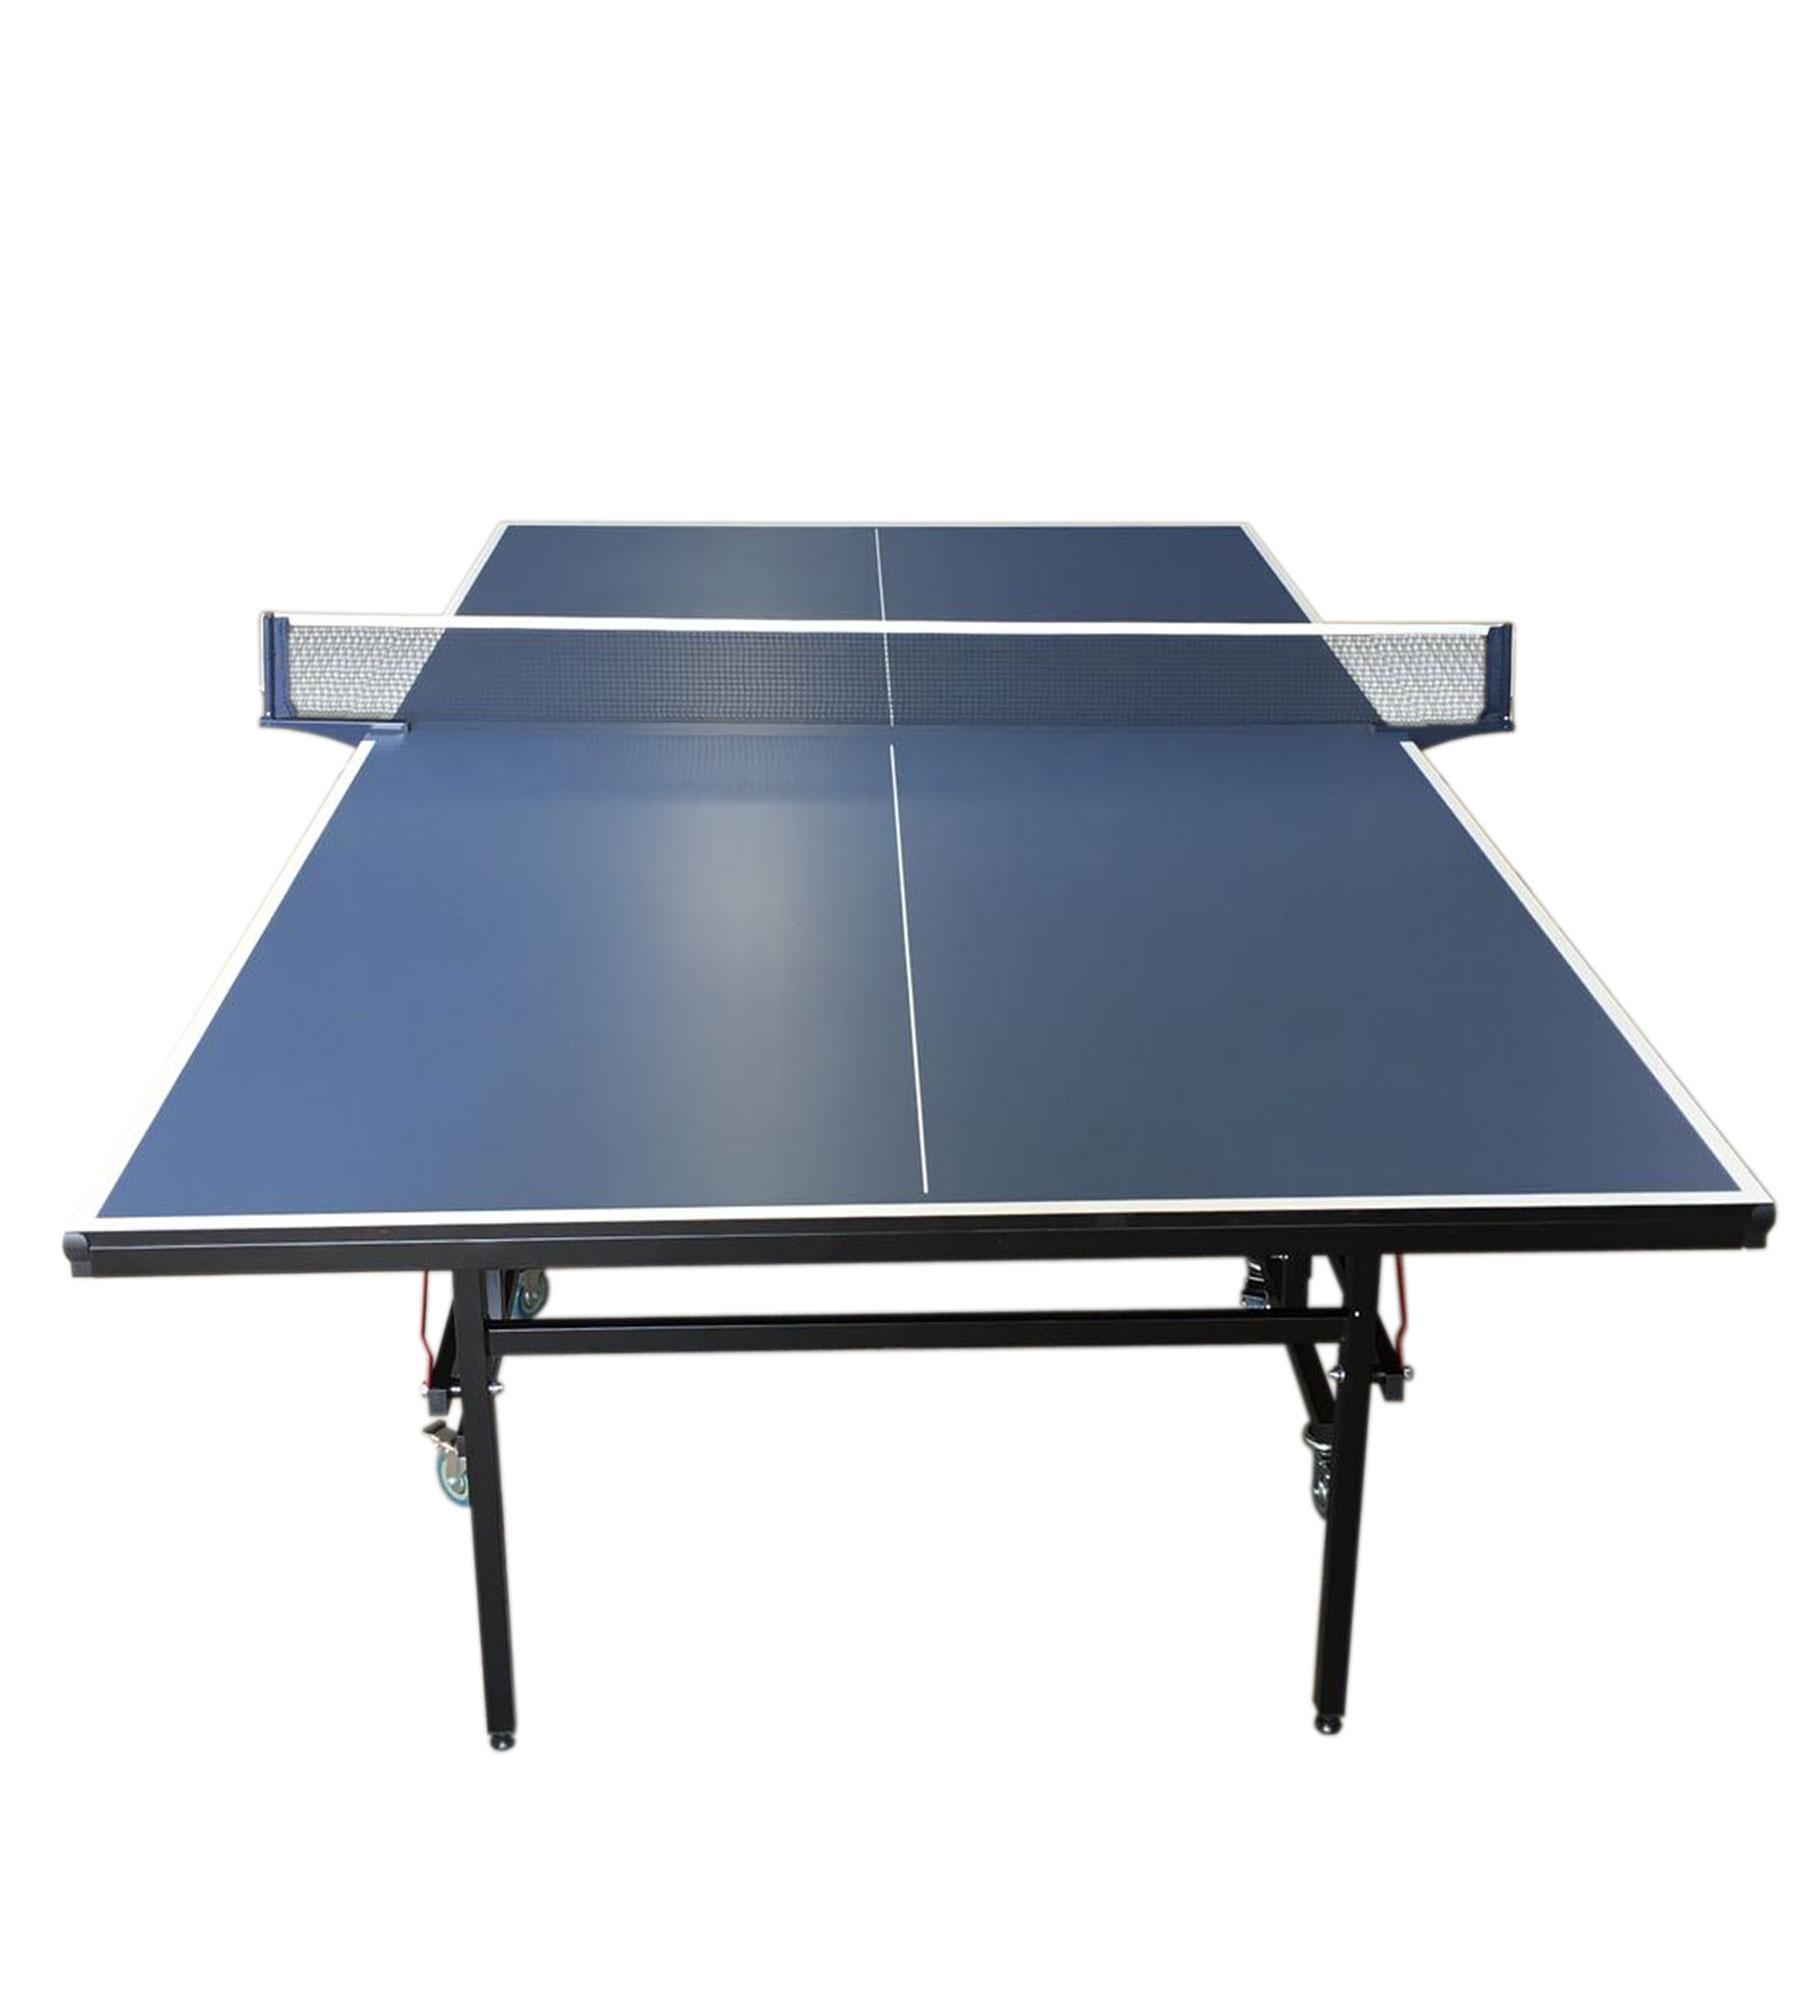 Tavolo da ping pong professionale roby pieghevole - Misure tavolo da ping pong professionale ...